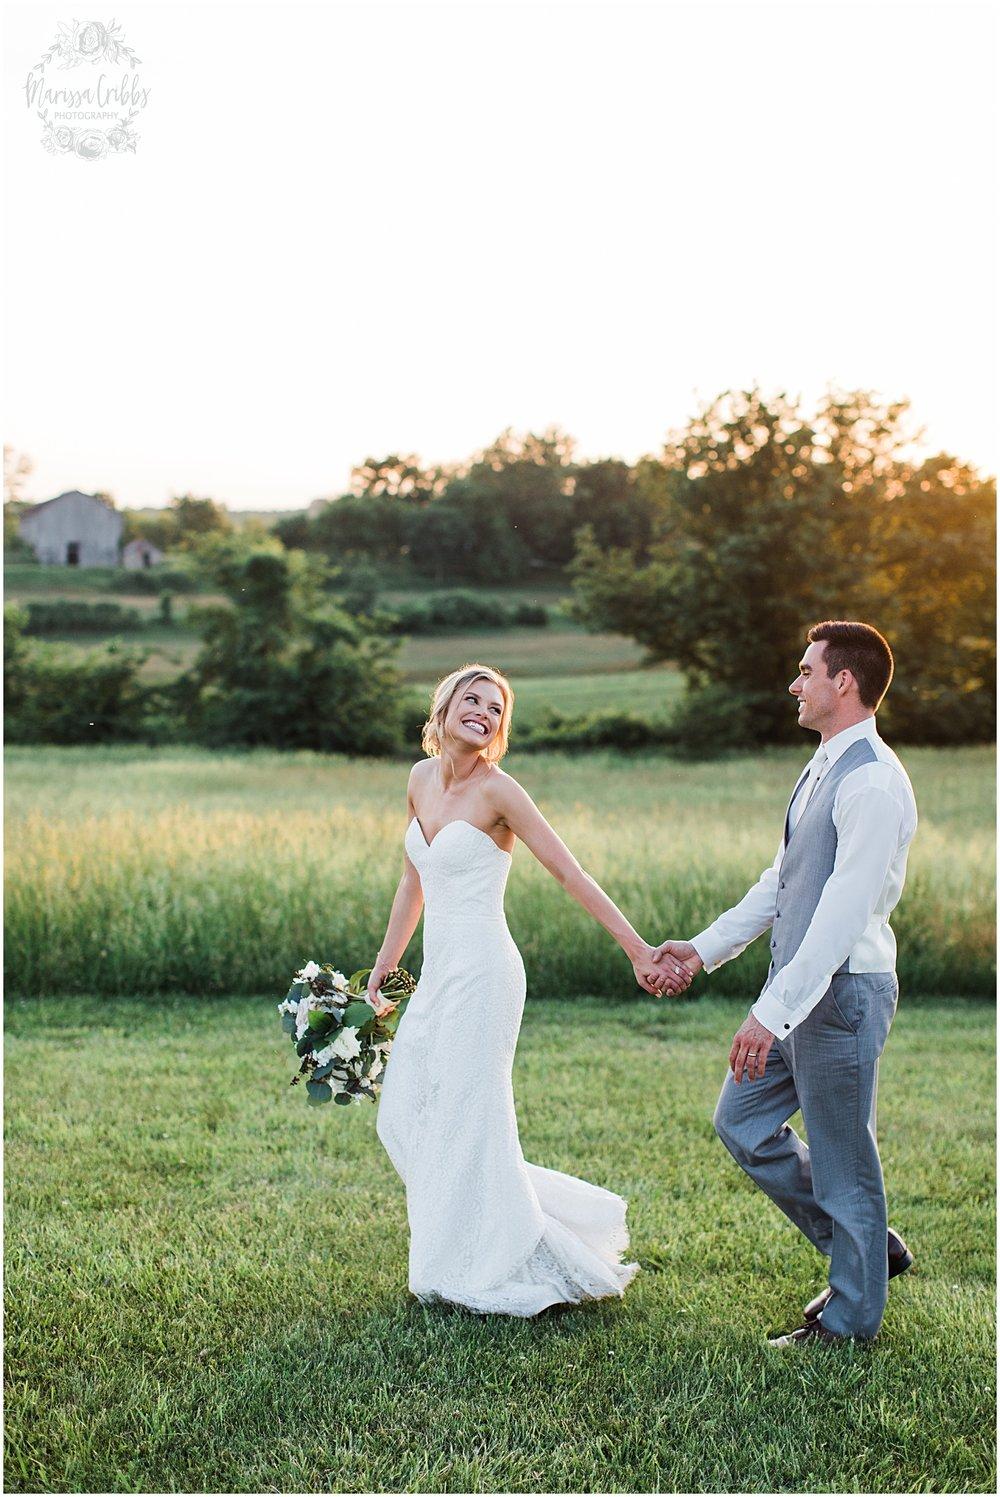 RHODES WEDDING | WESTON RED BARN FARM | MARISSA CRIBBS PHOTOGRAPHY_5321.jpg